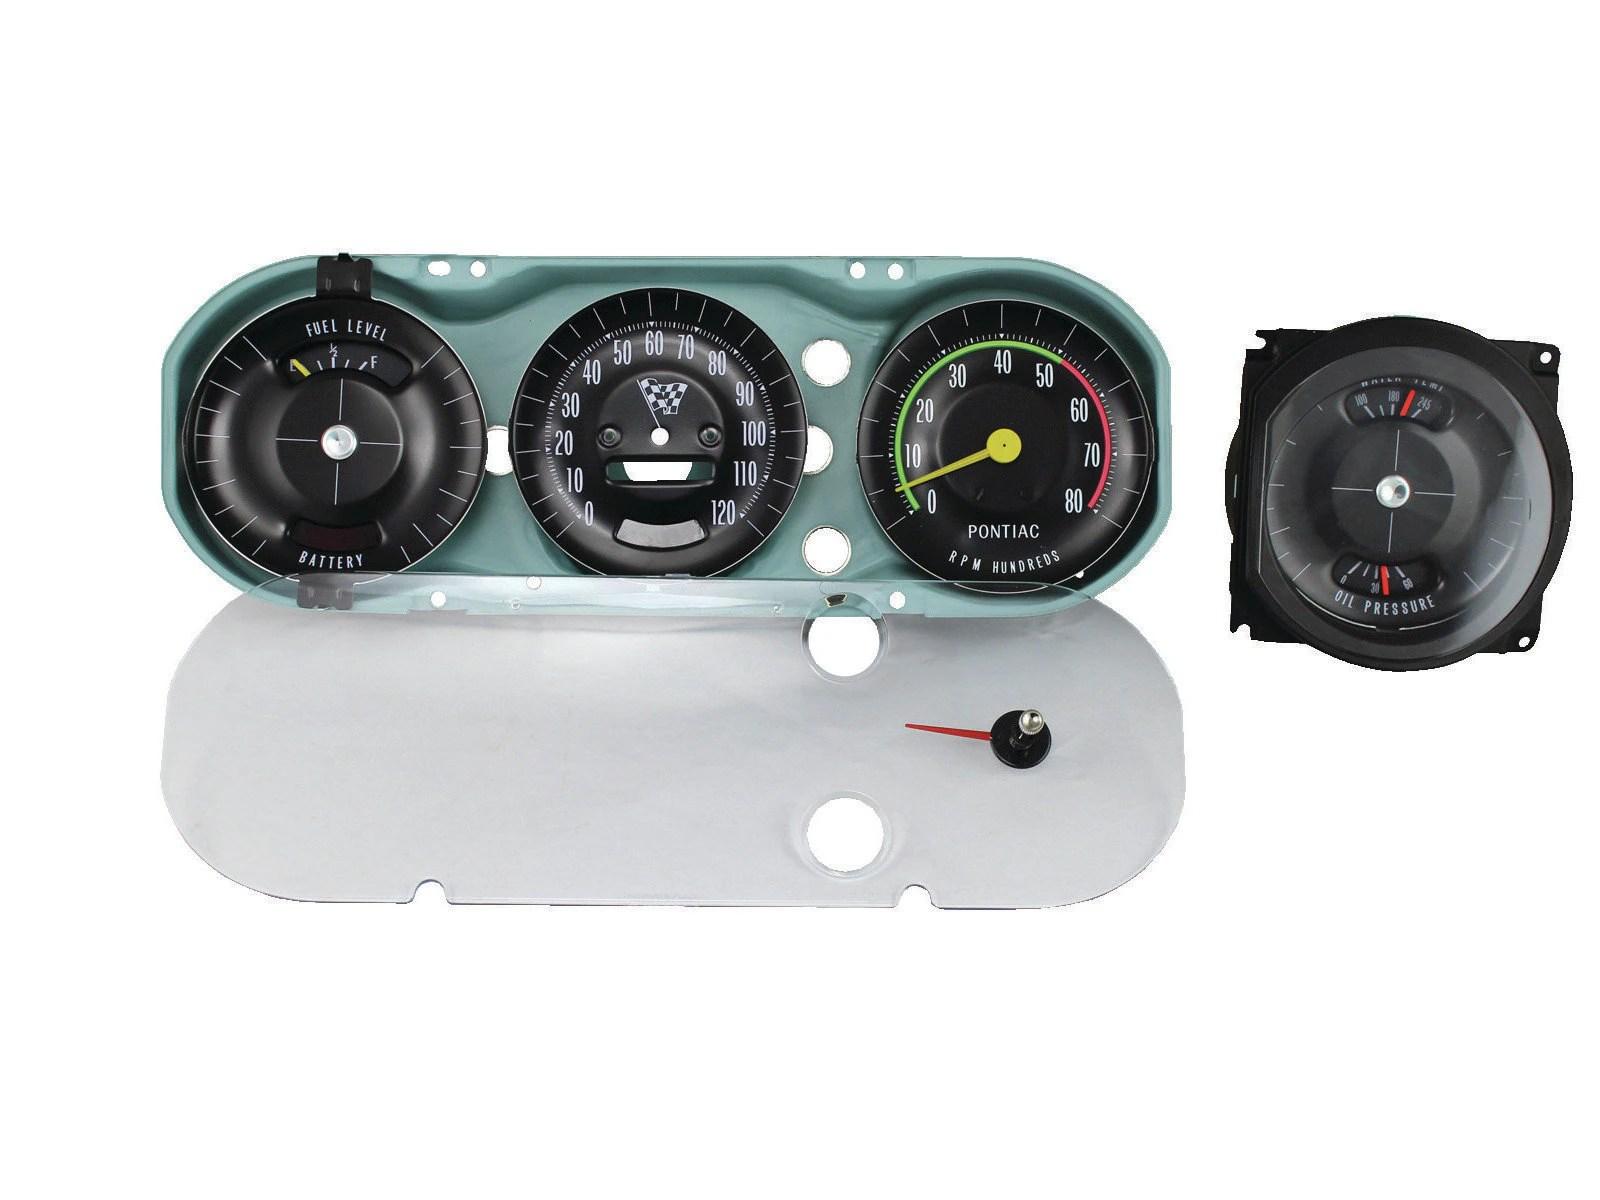 1965 gto rally gauges wiring diagram diagram database reg mix 1965 gto rally gauges wiring diagram 1967  [ 1600 x 1200 Pixel ]